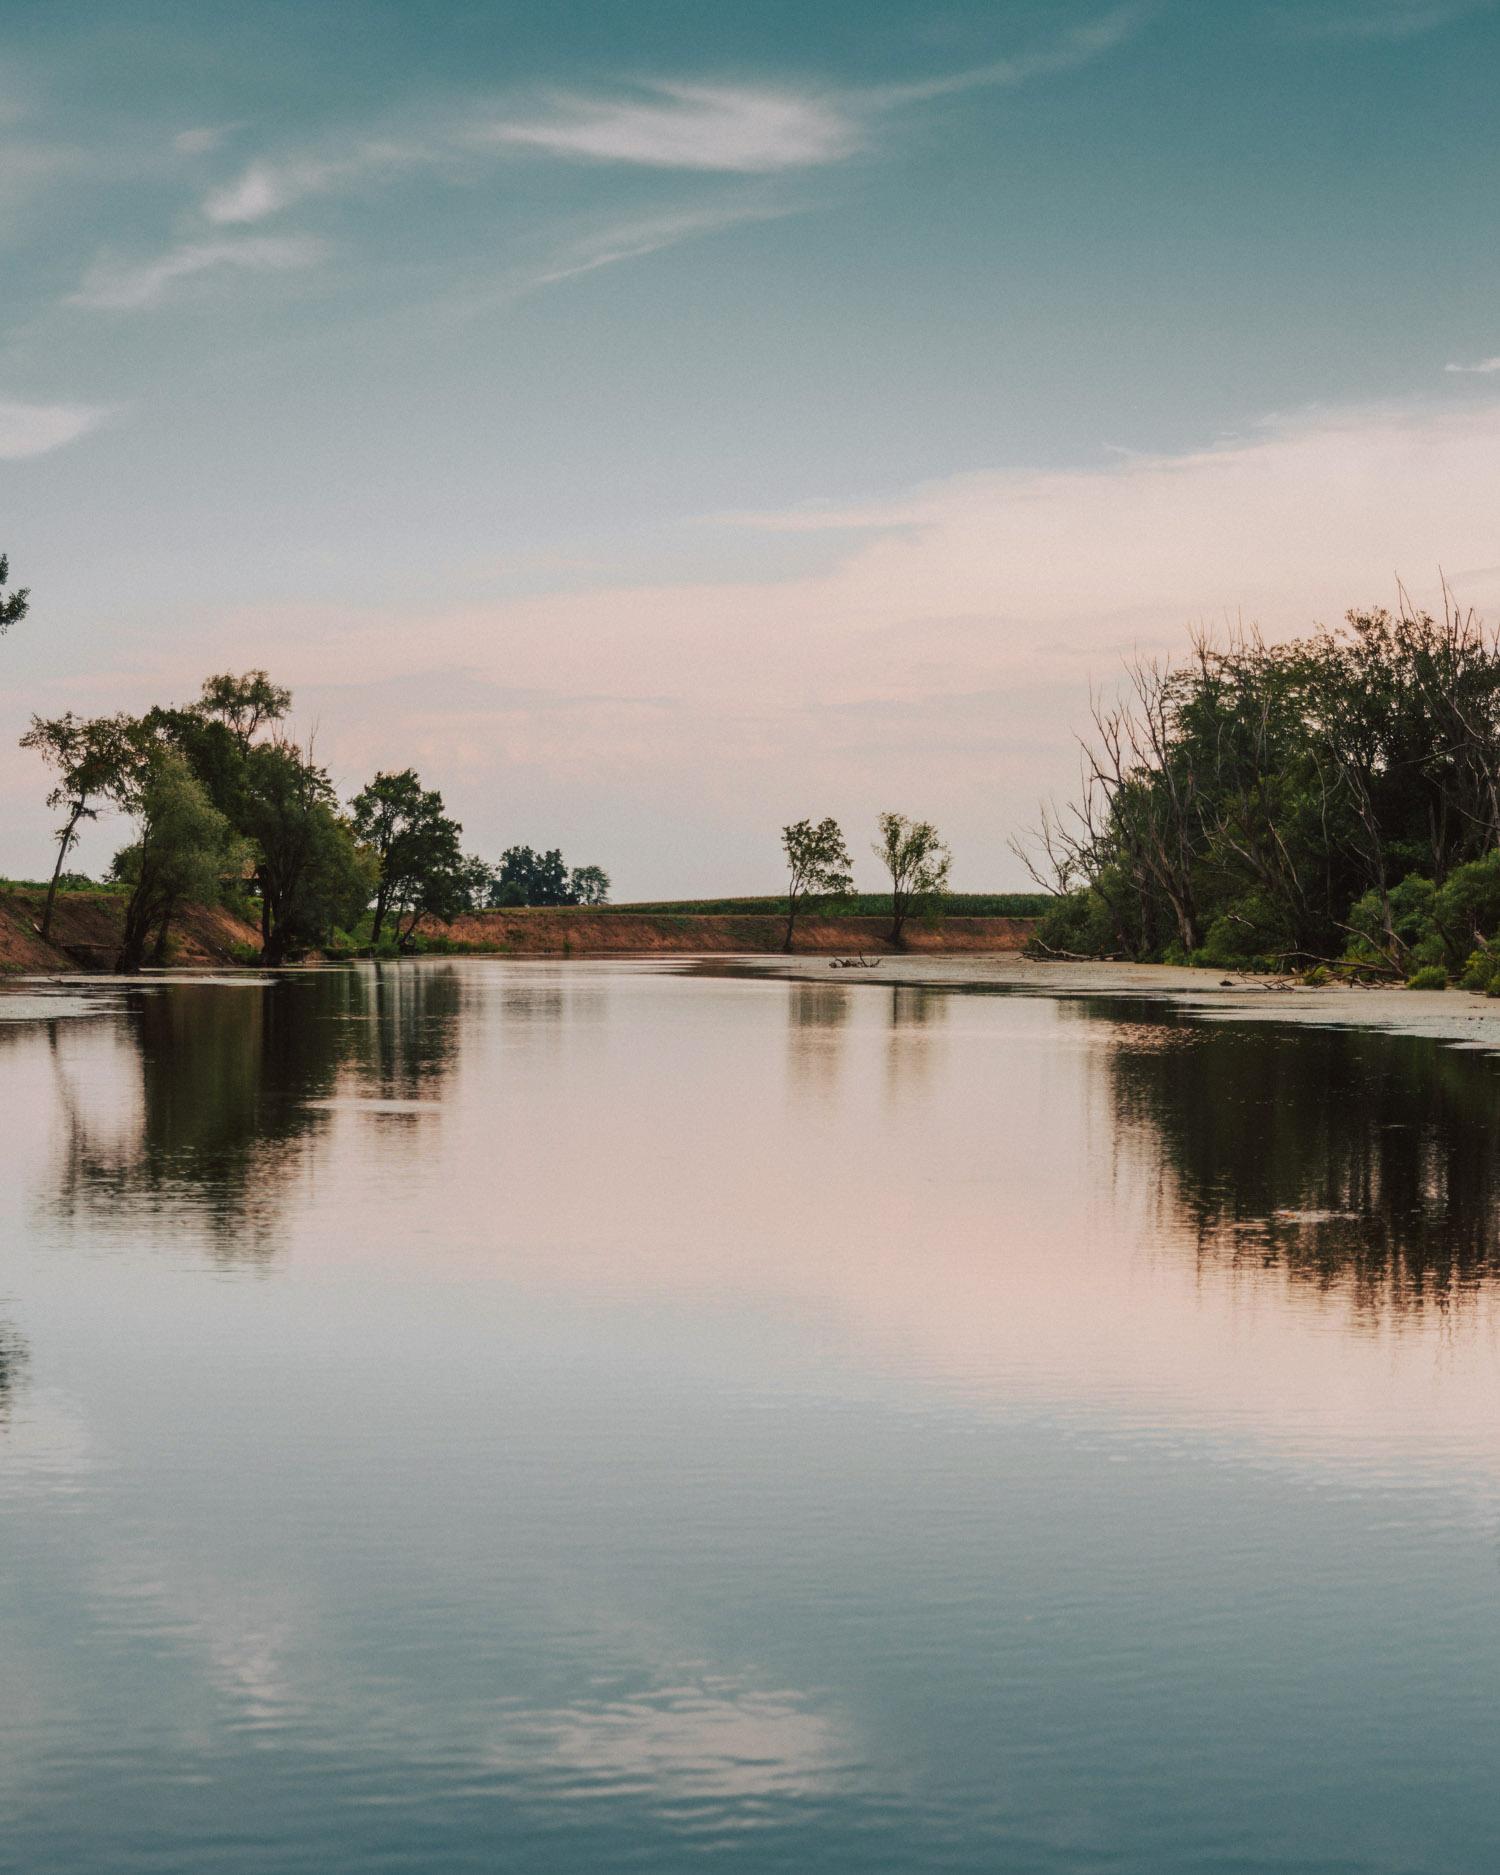 Birdwatching in Baranja | River Bosut, Croatia